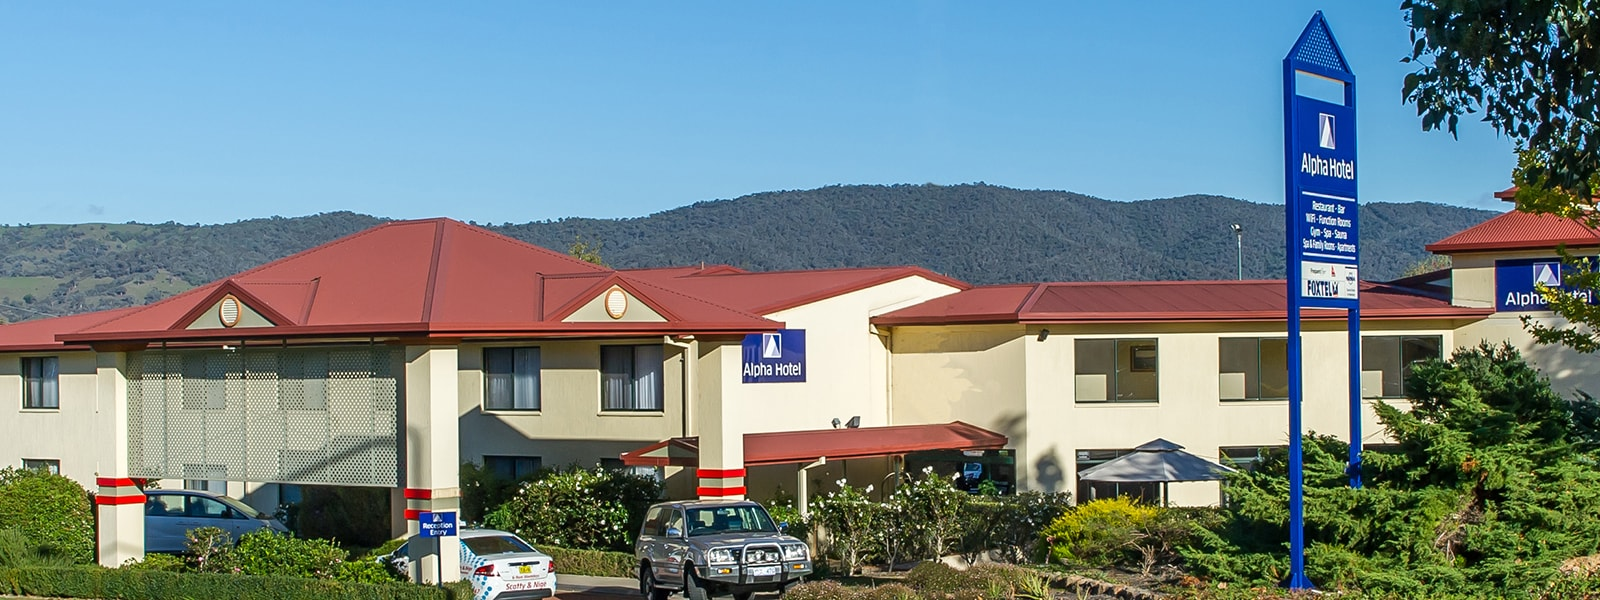 Alpha Hotel Canberra Exterior